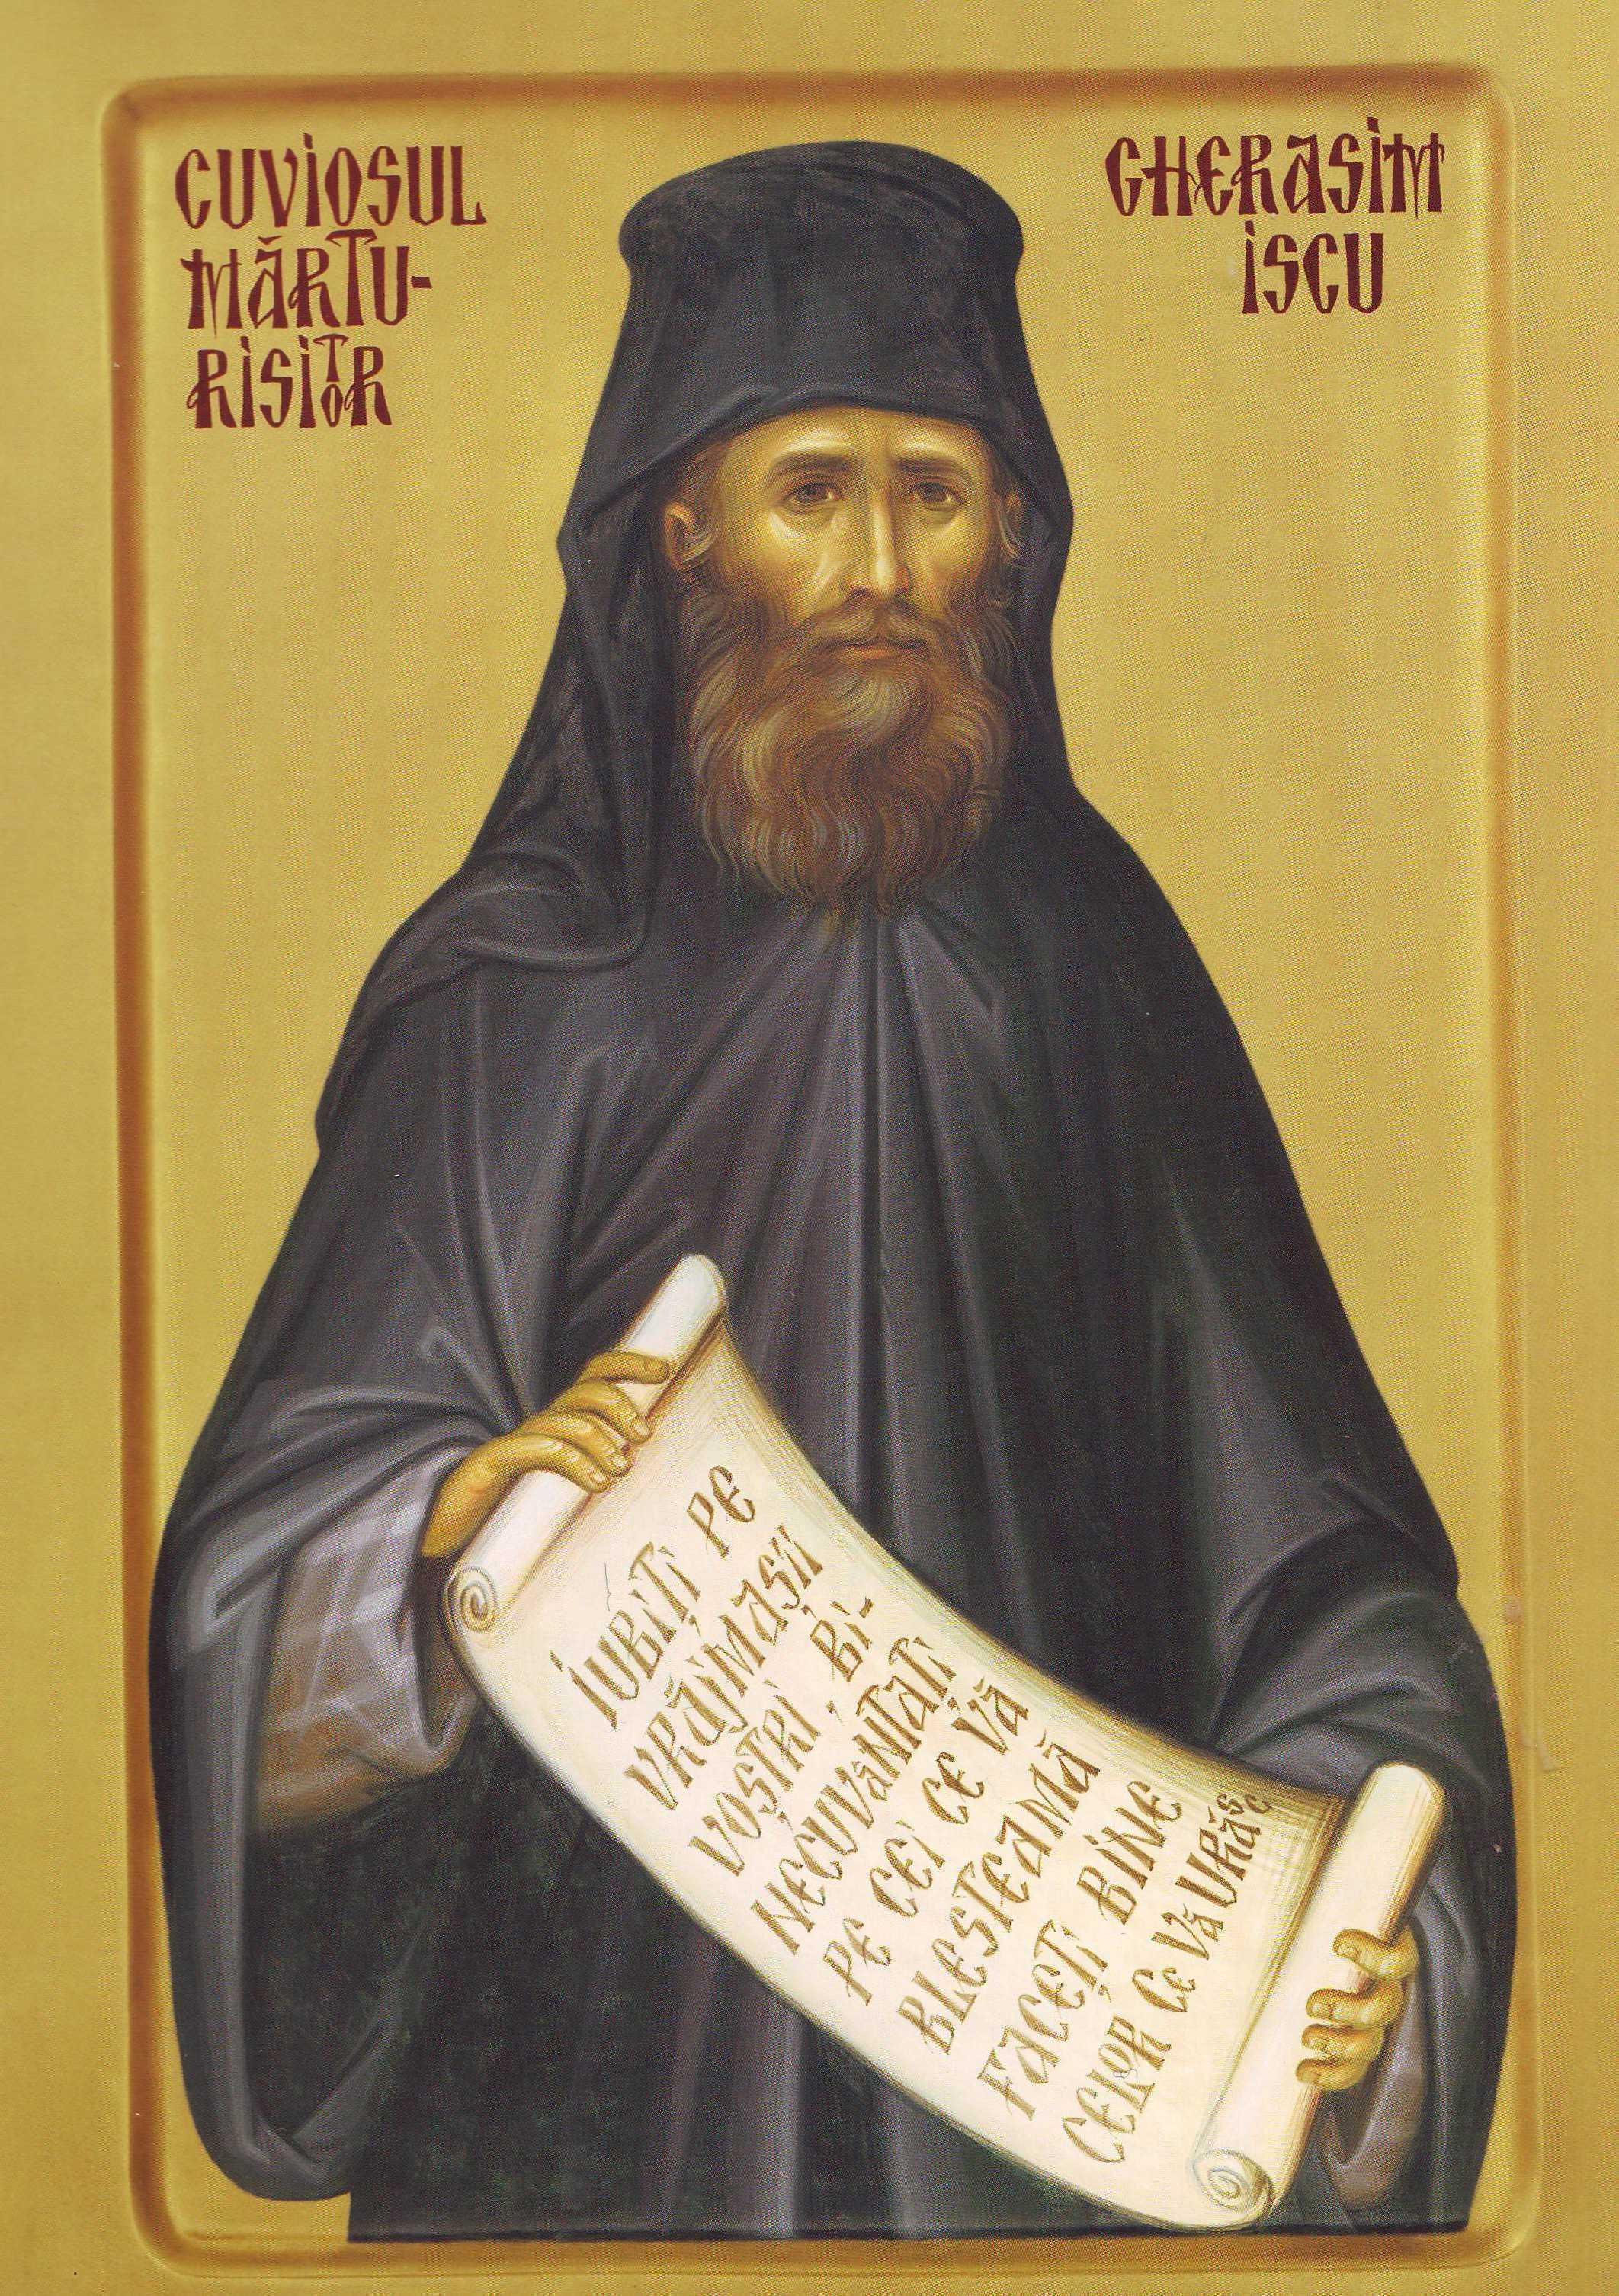 Viata cuviosului martir GHERASIM ISCU si marturia pretioasa data de nepotul sau, IOAN ISCU